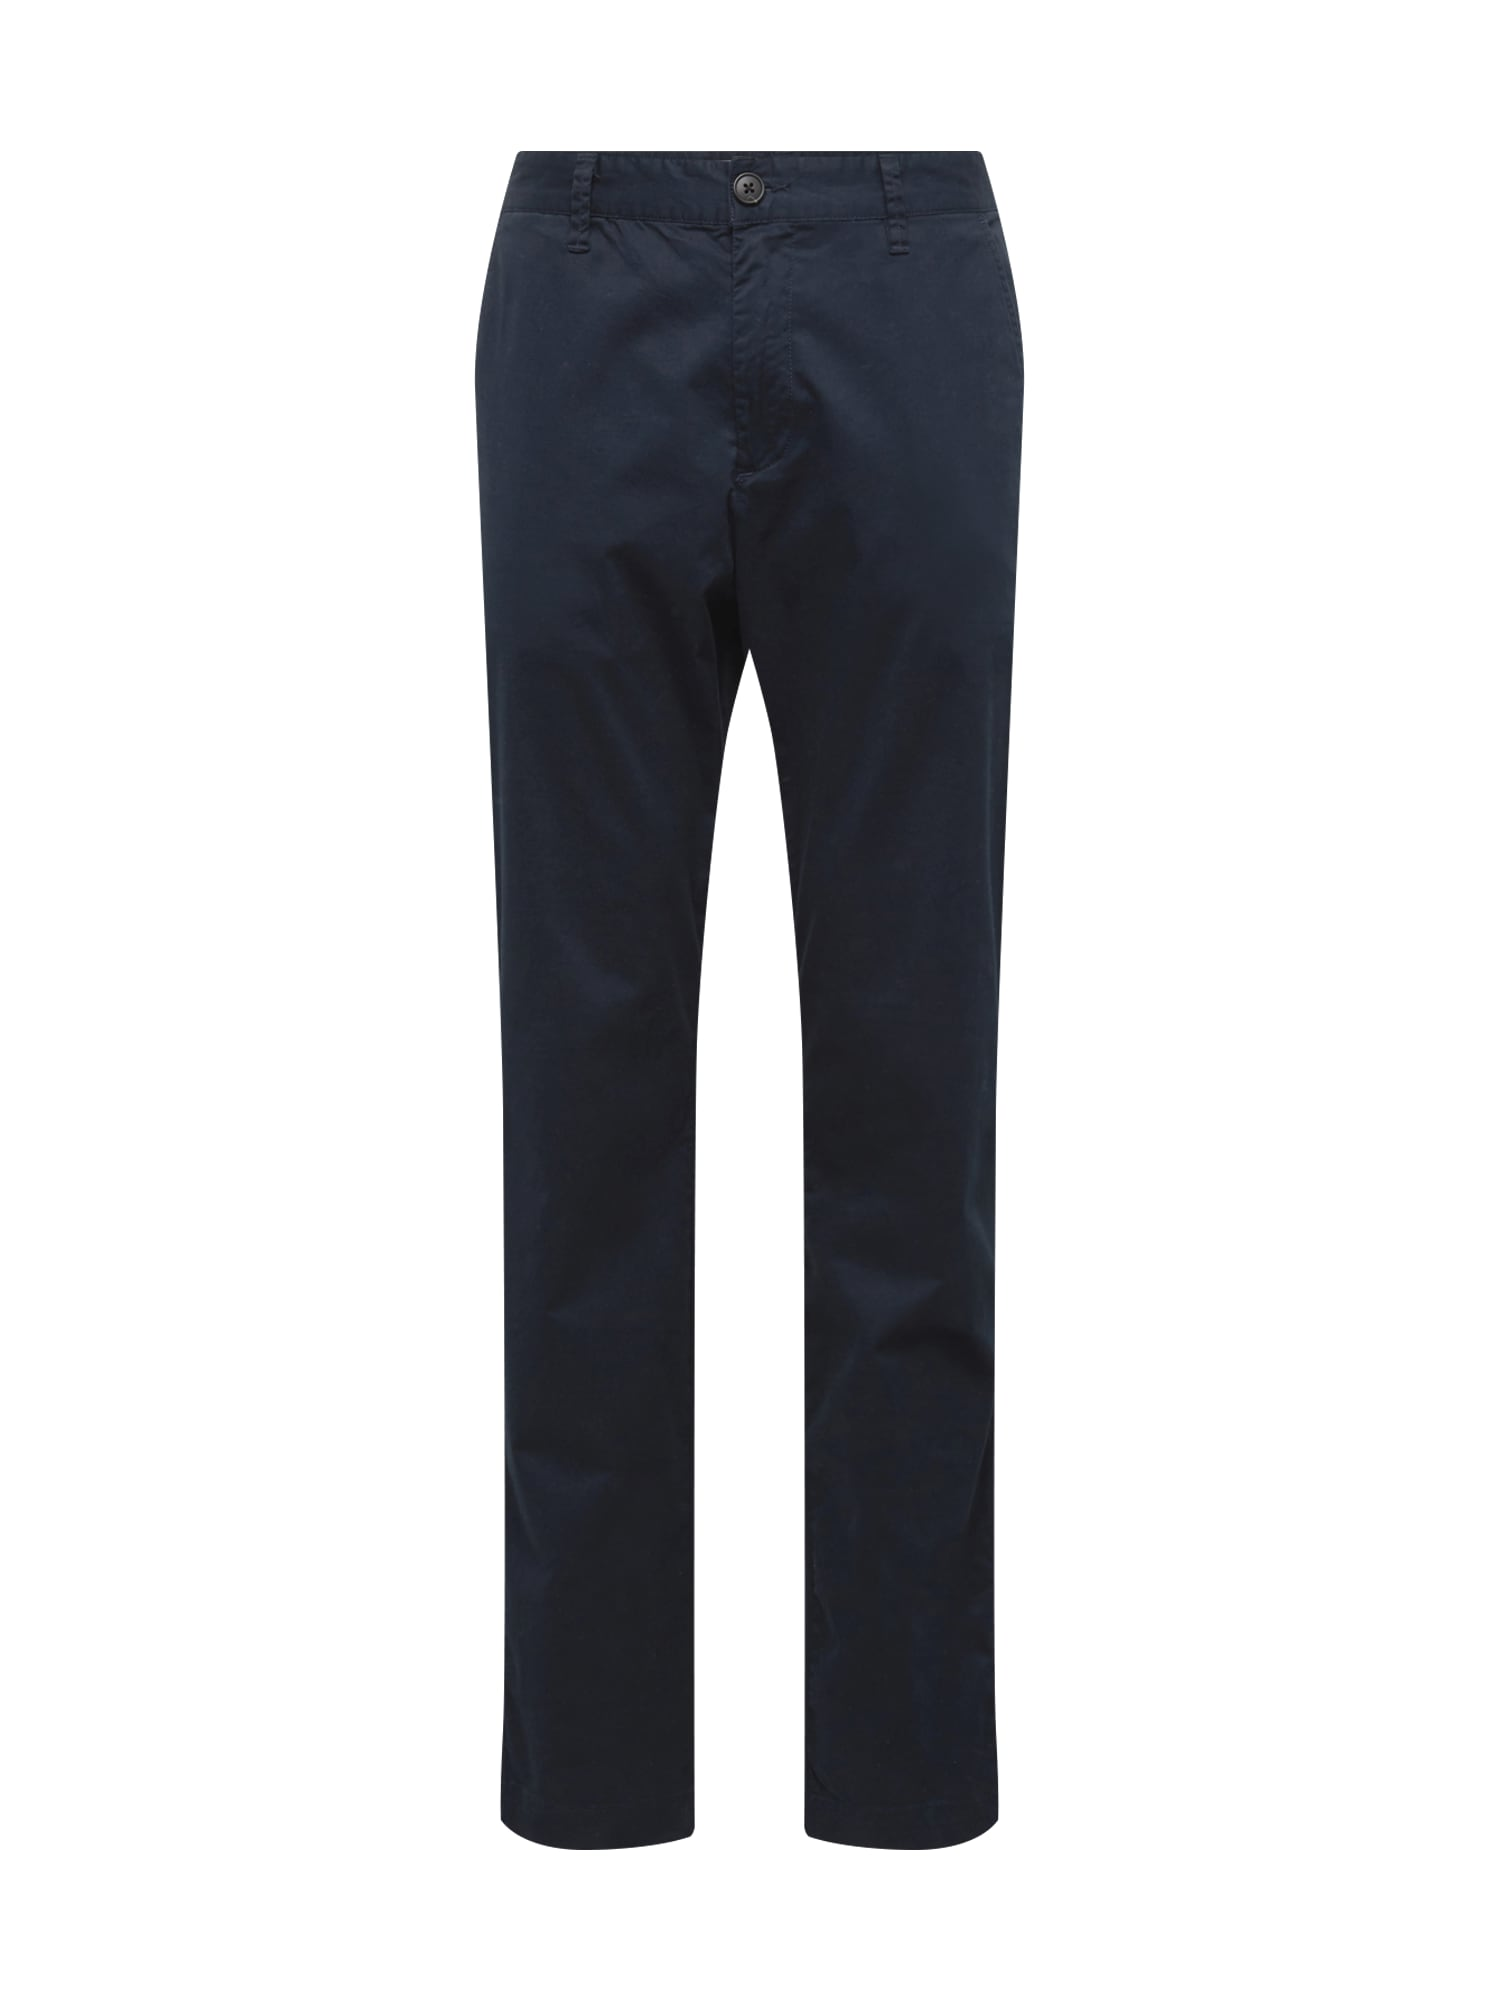 Chino kalhoty Luke tmavě modrá SELECTED HOMME